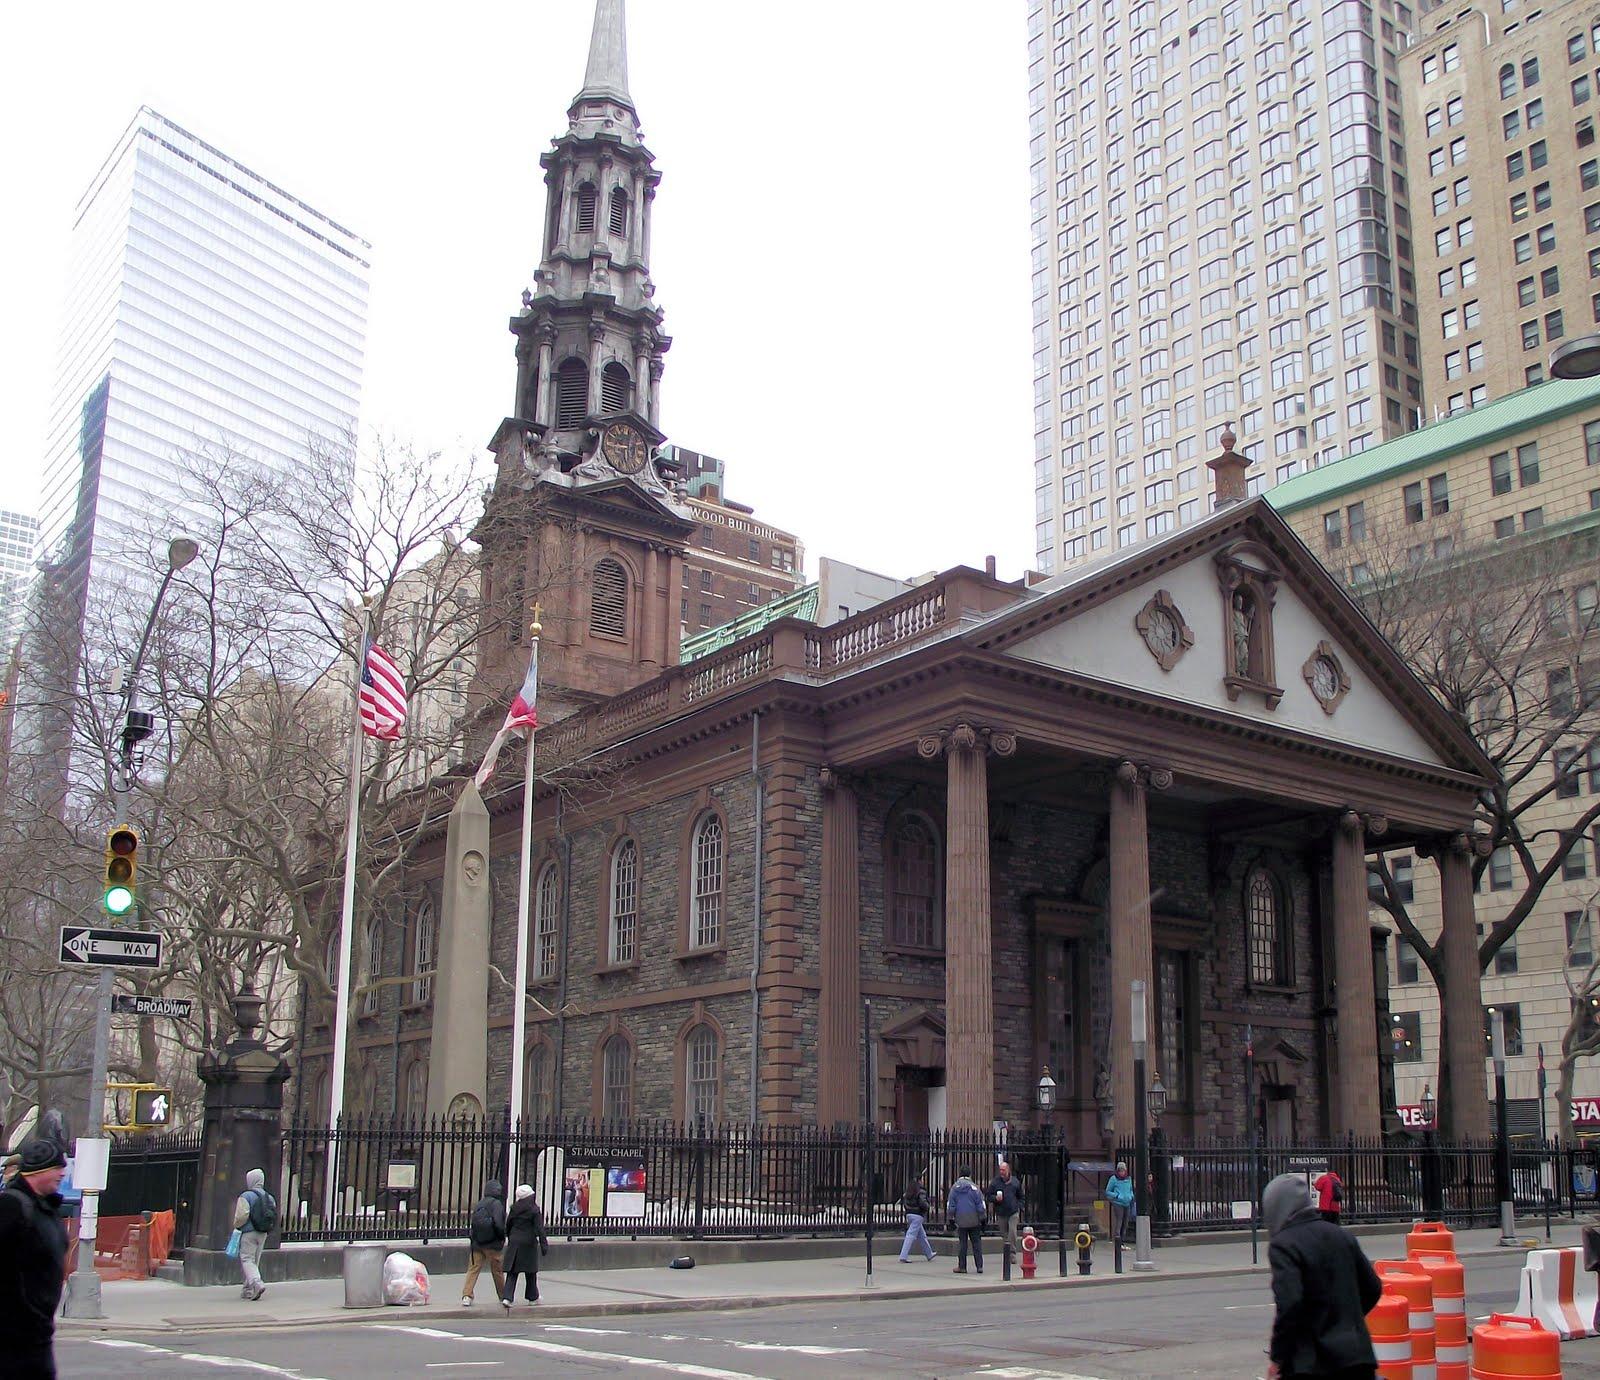 st-paul-s-chapel-is-the-oldest-church-i-secret-world